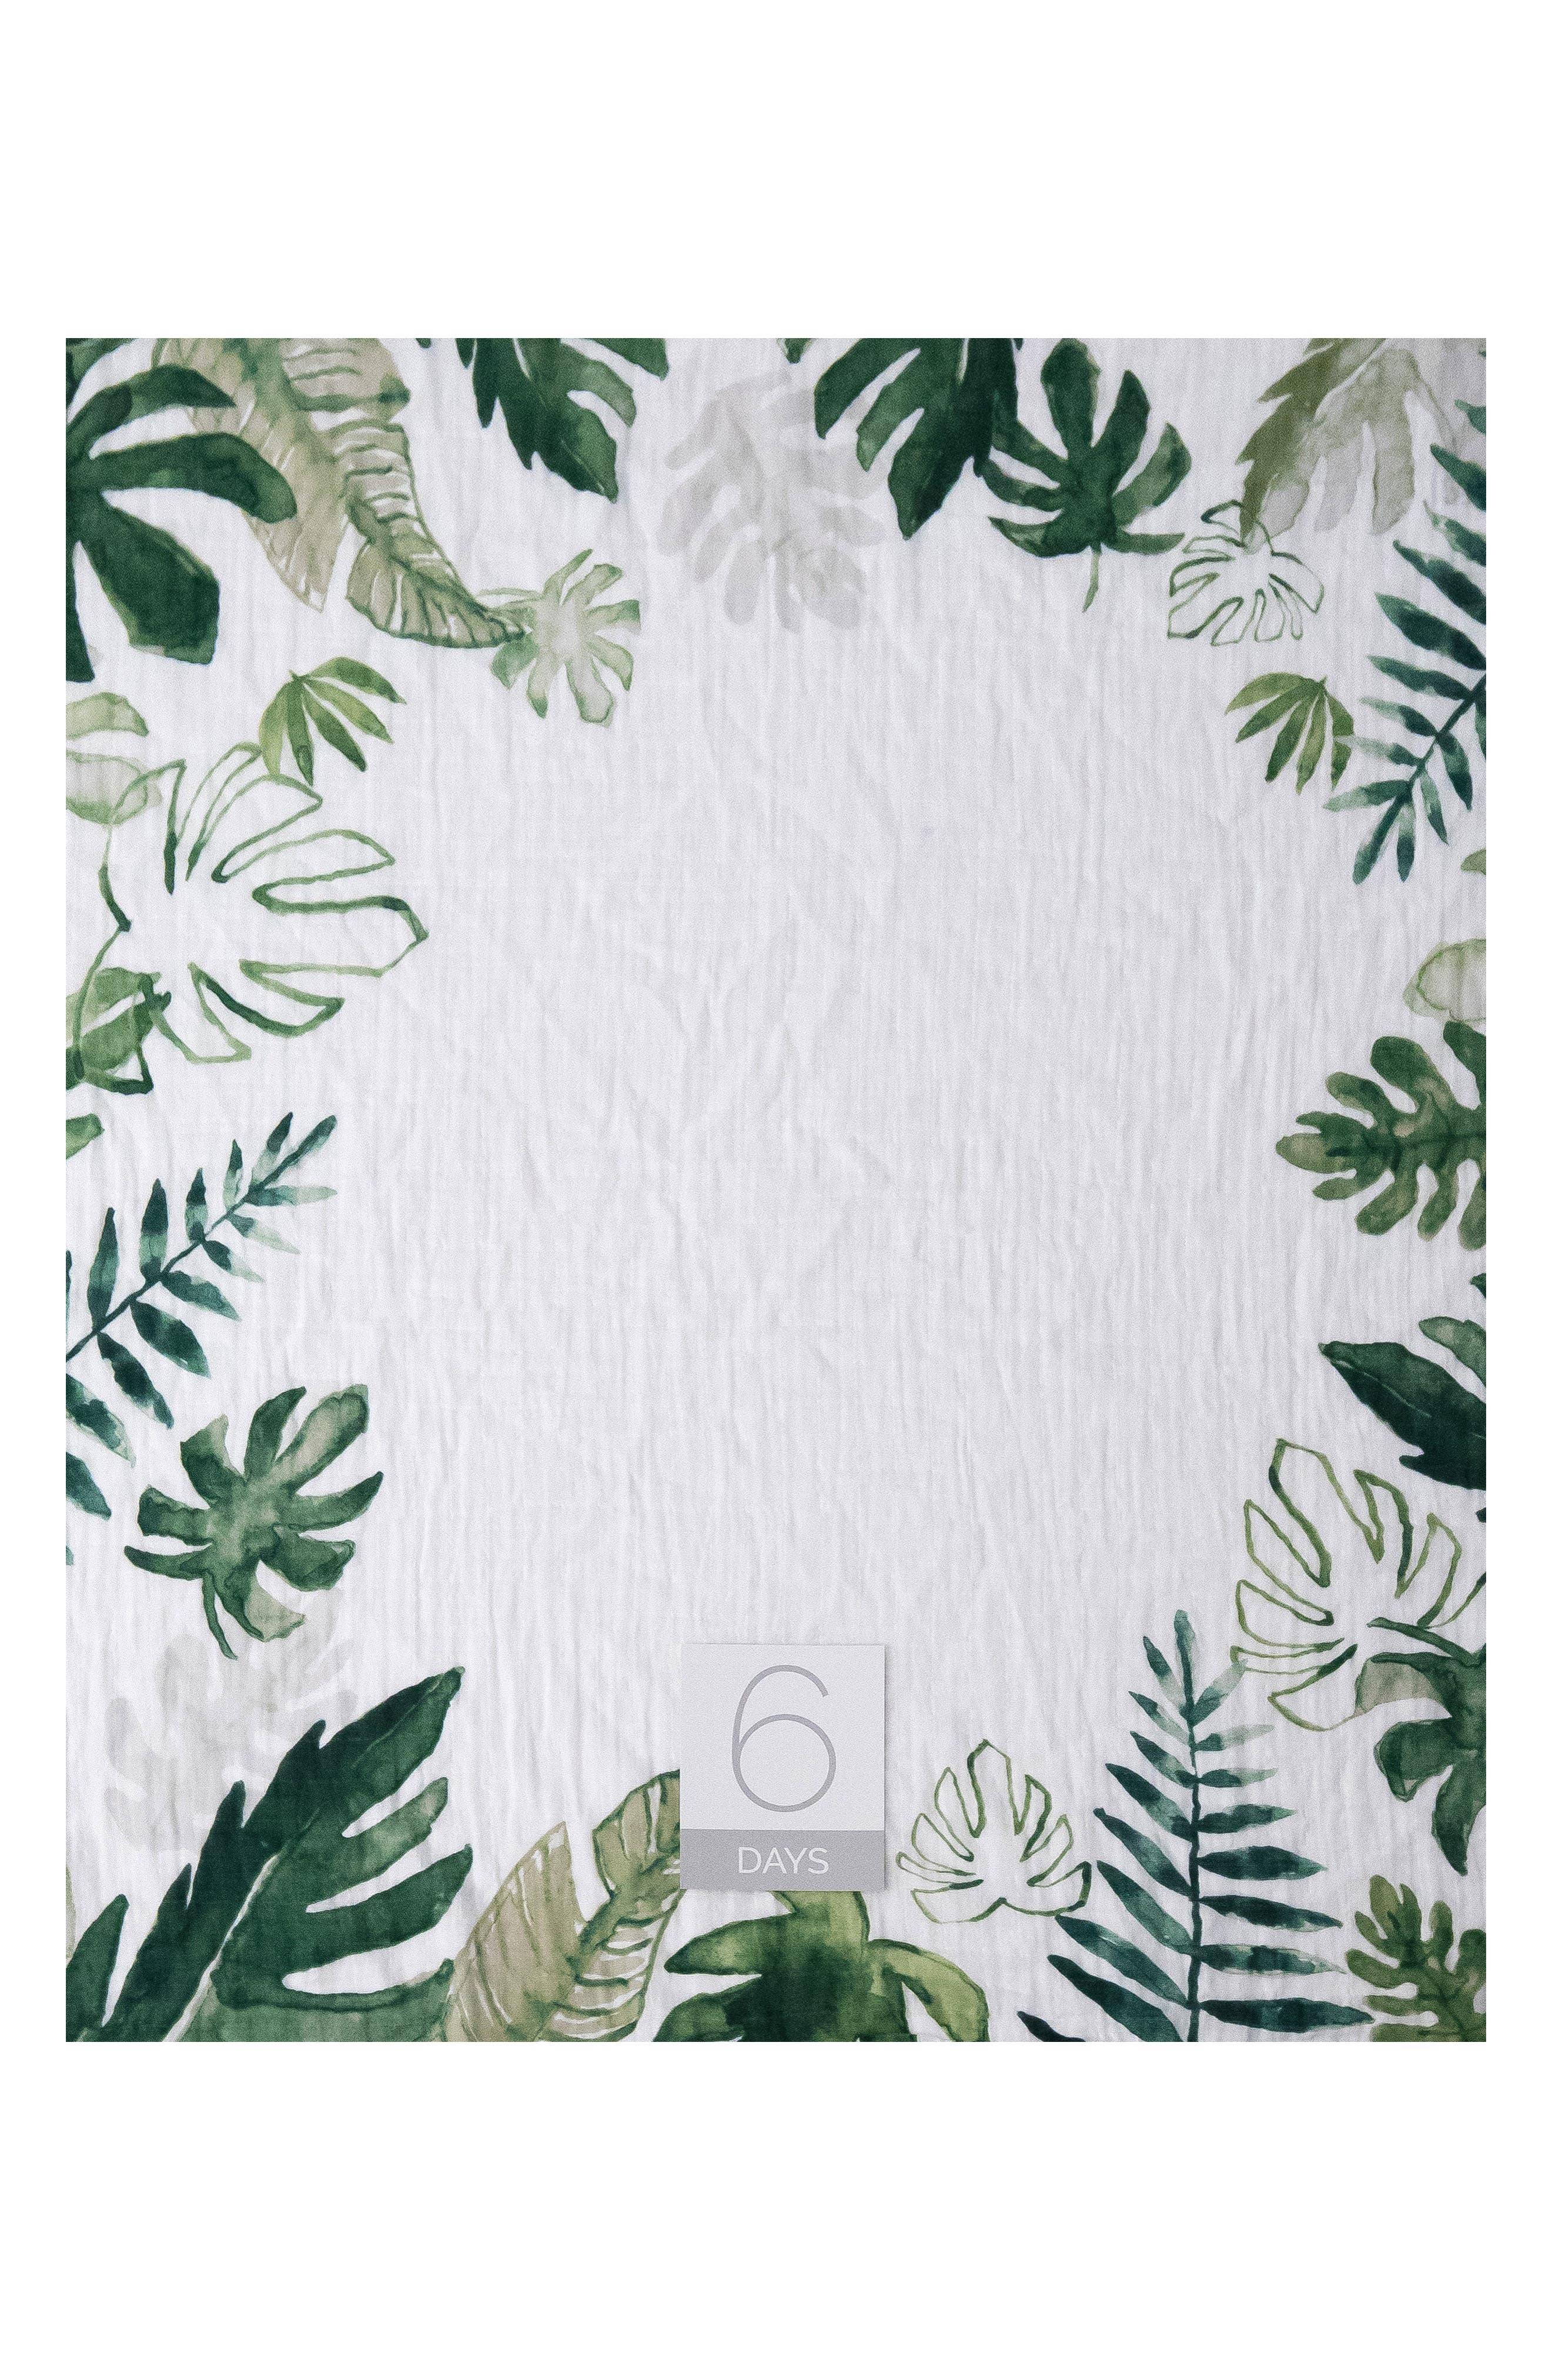 Little Unicorn Photo Blanket & Age Cards Kit, Size One Size - Green